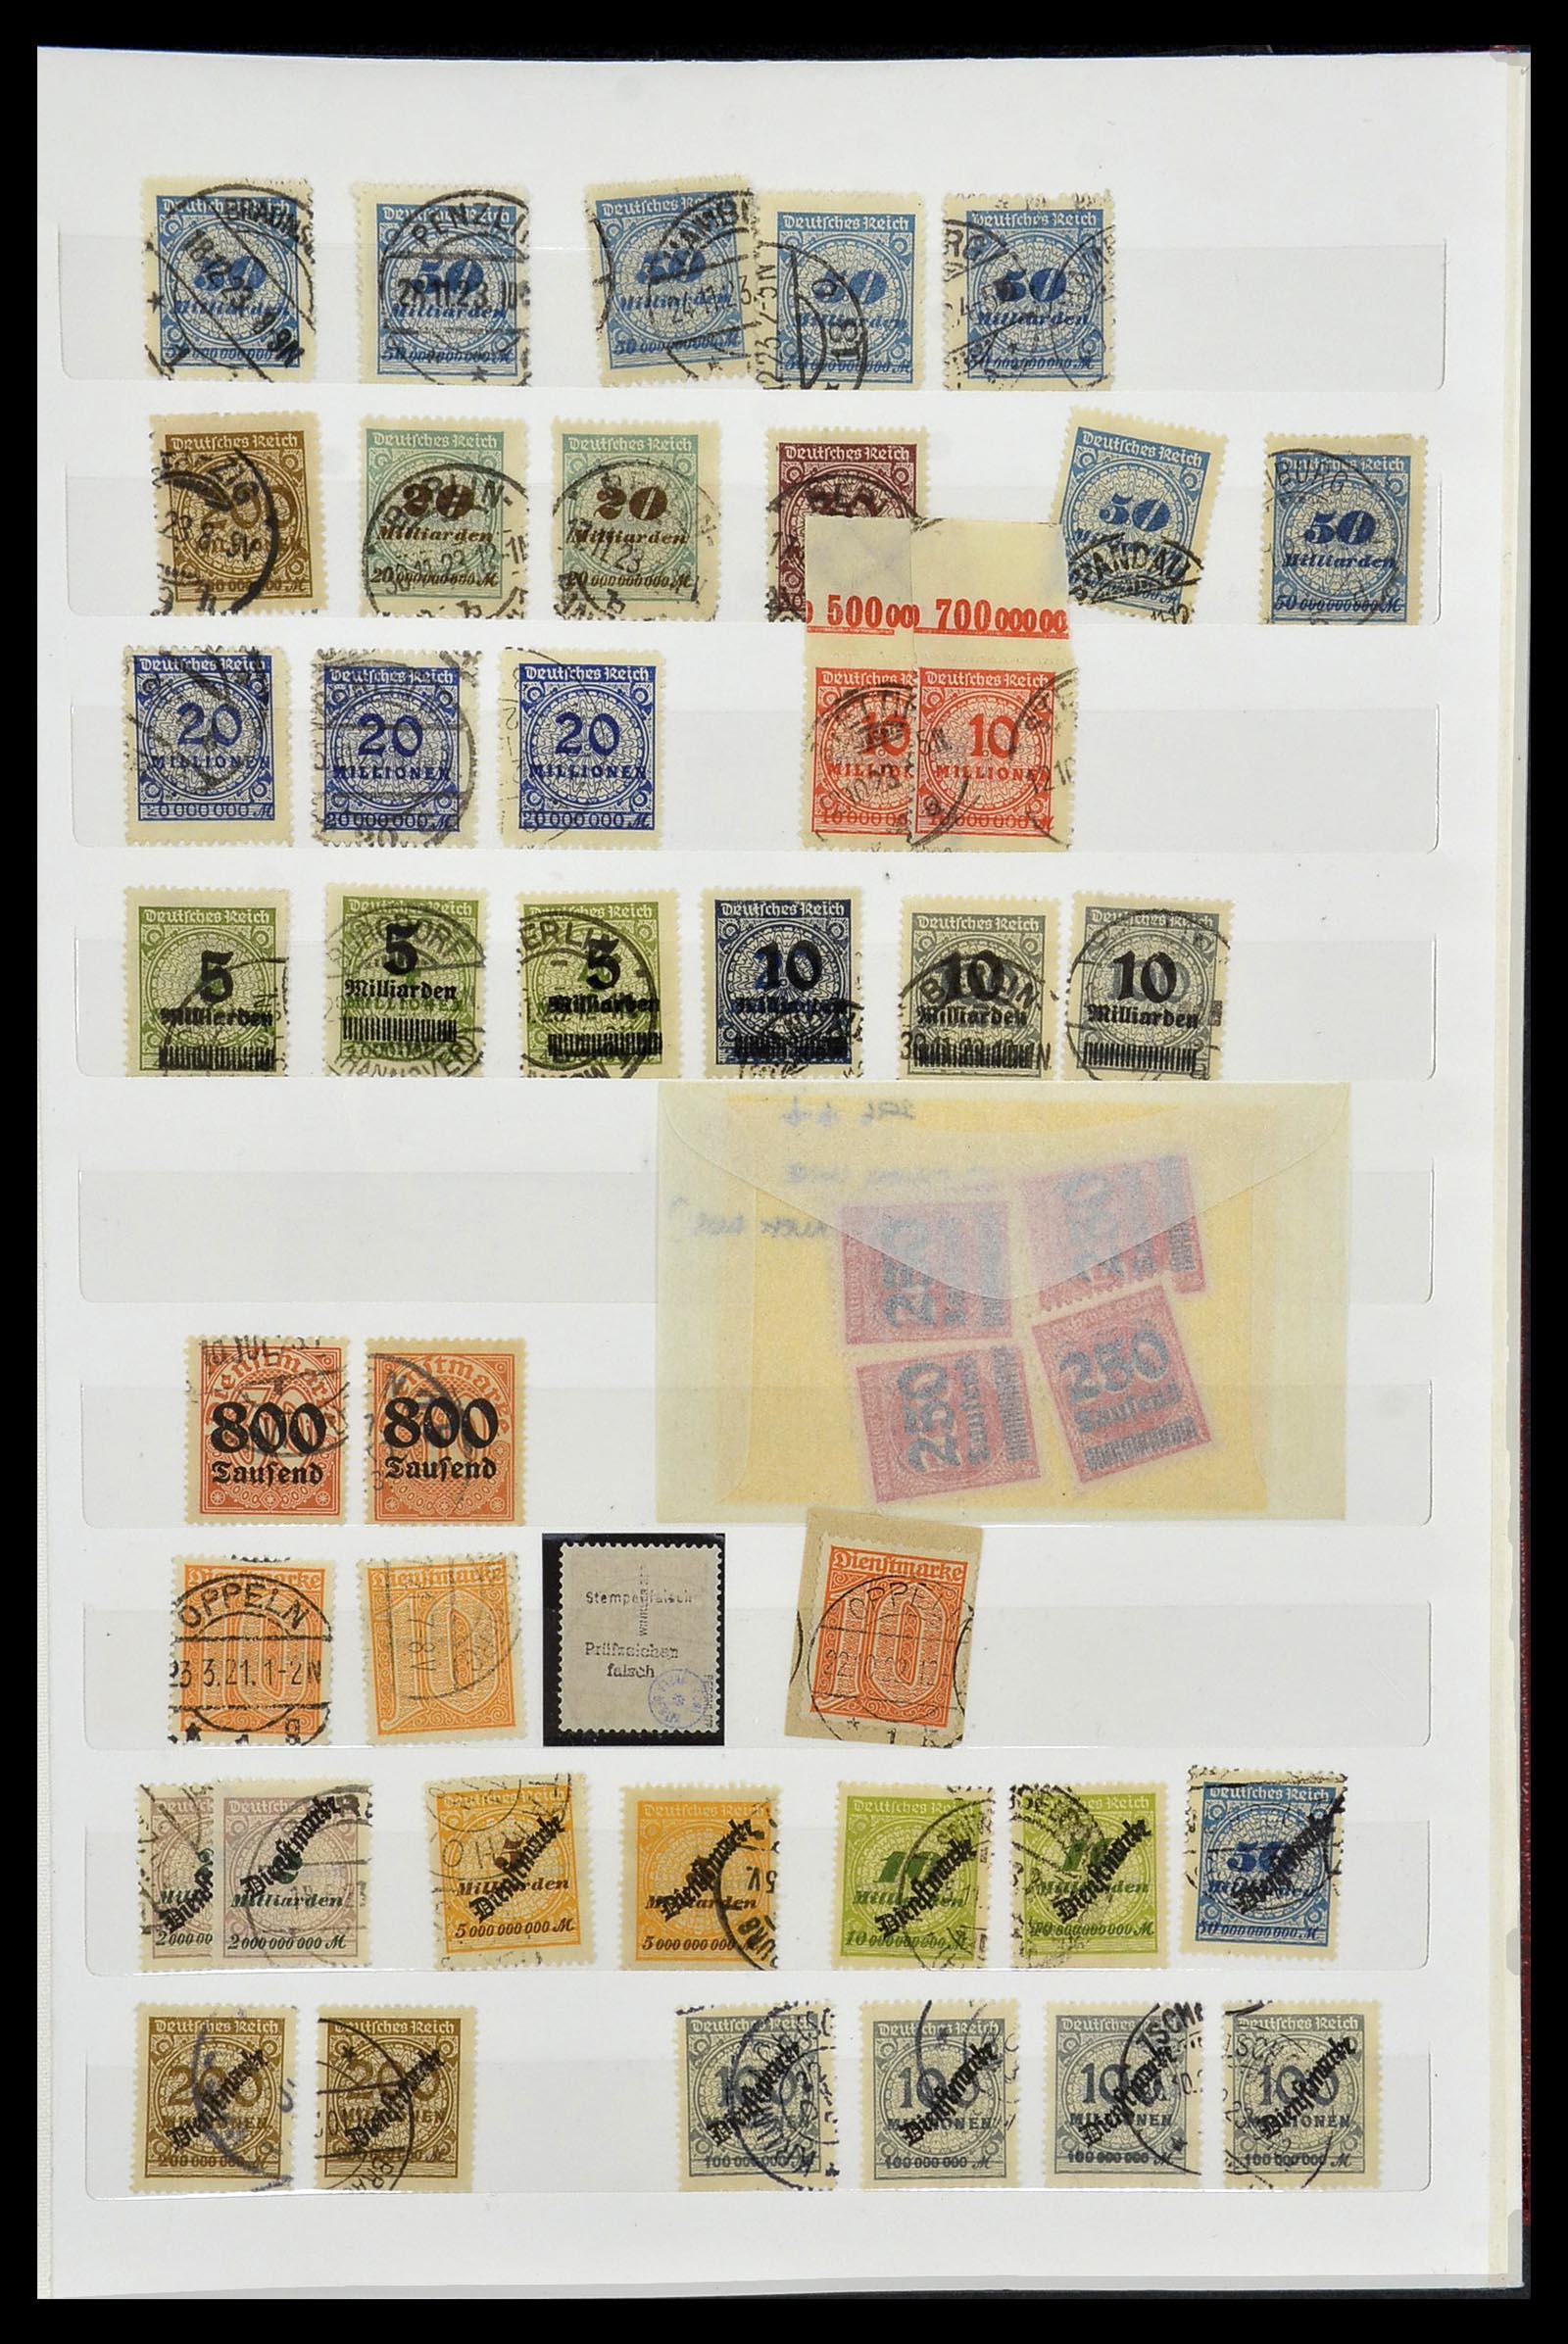 34069 003 - Postzegelverzameling 34069 Duitsland 1855-1952.